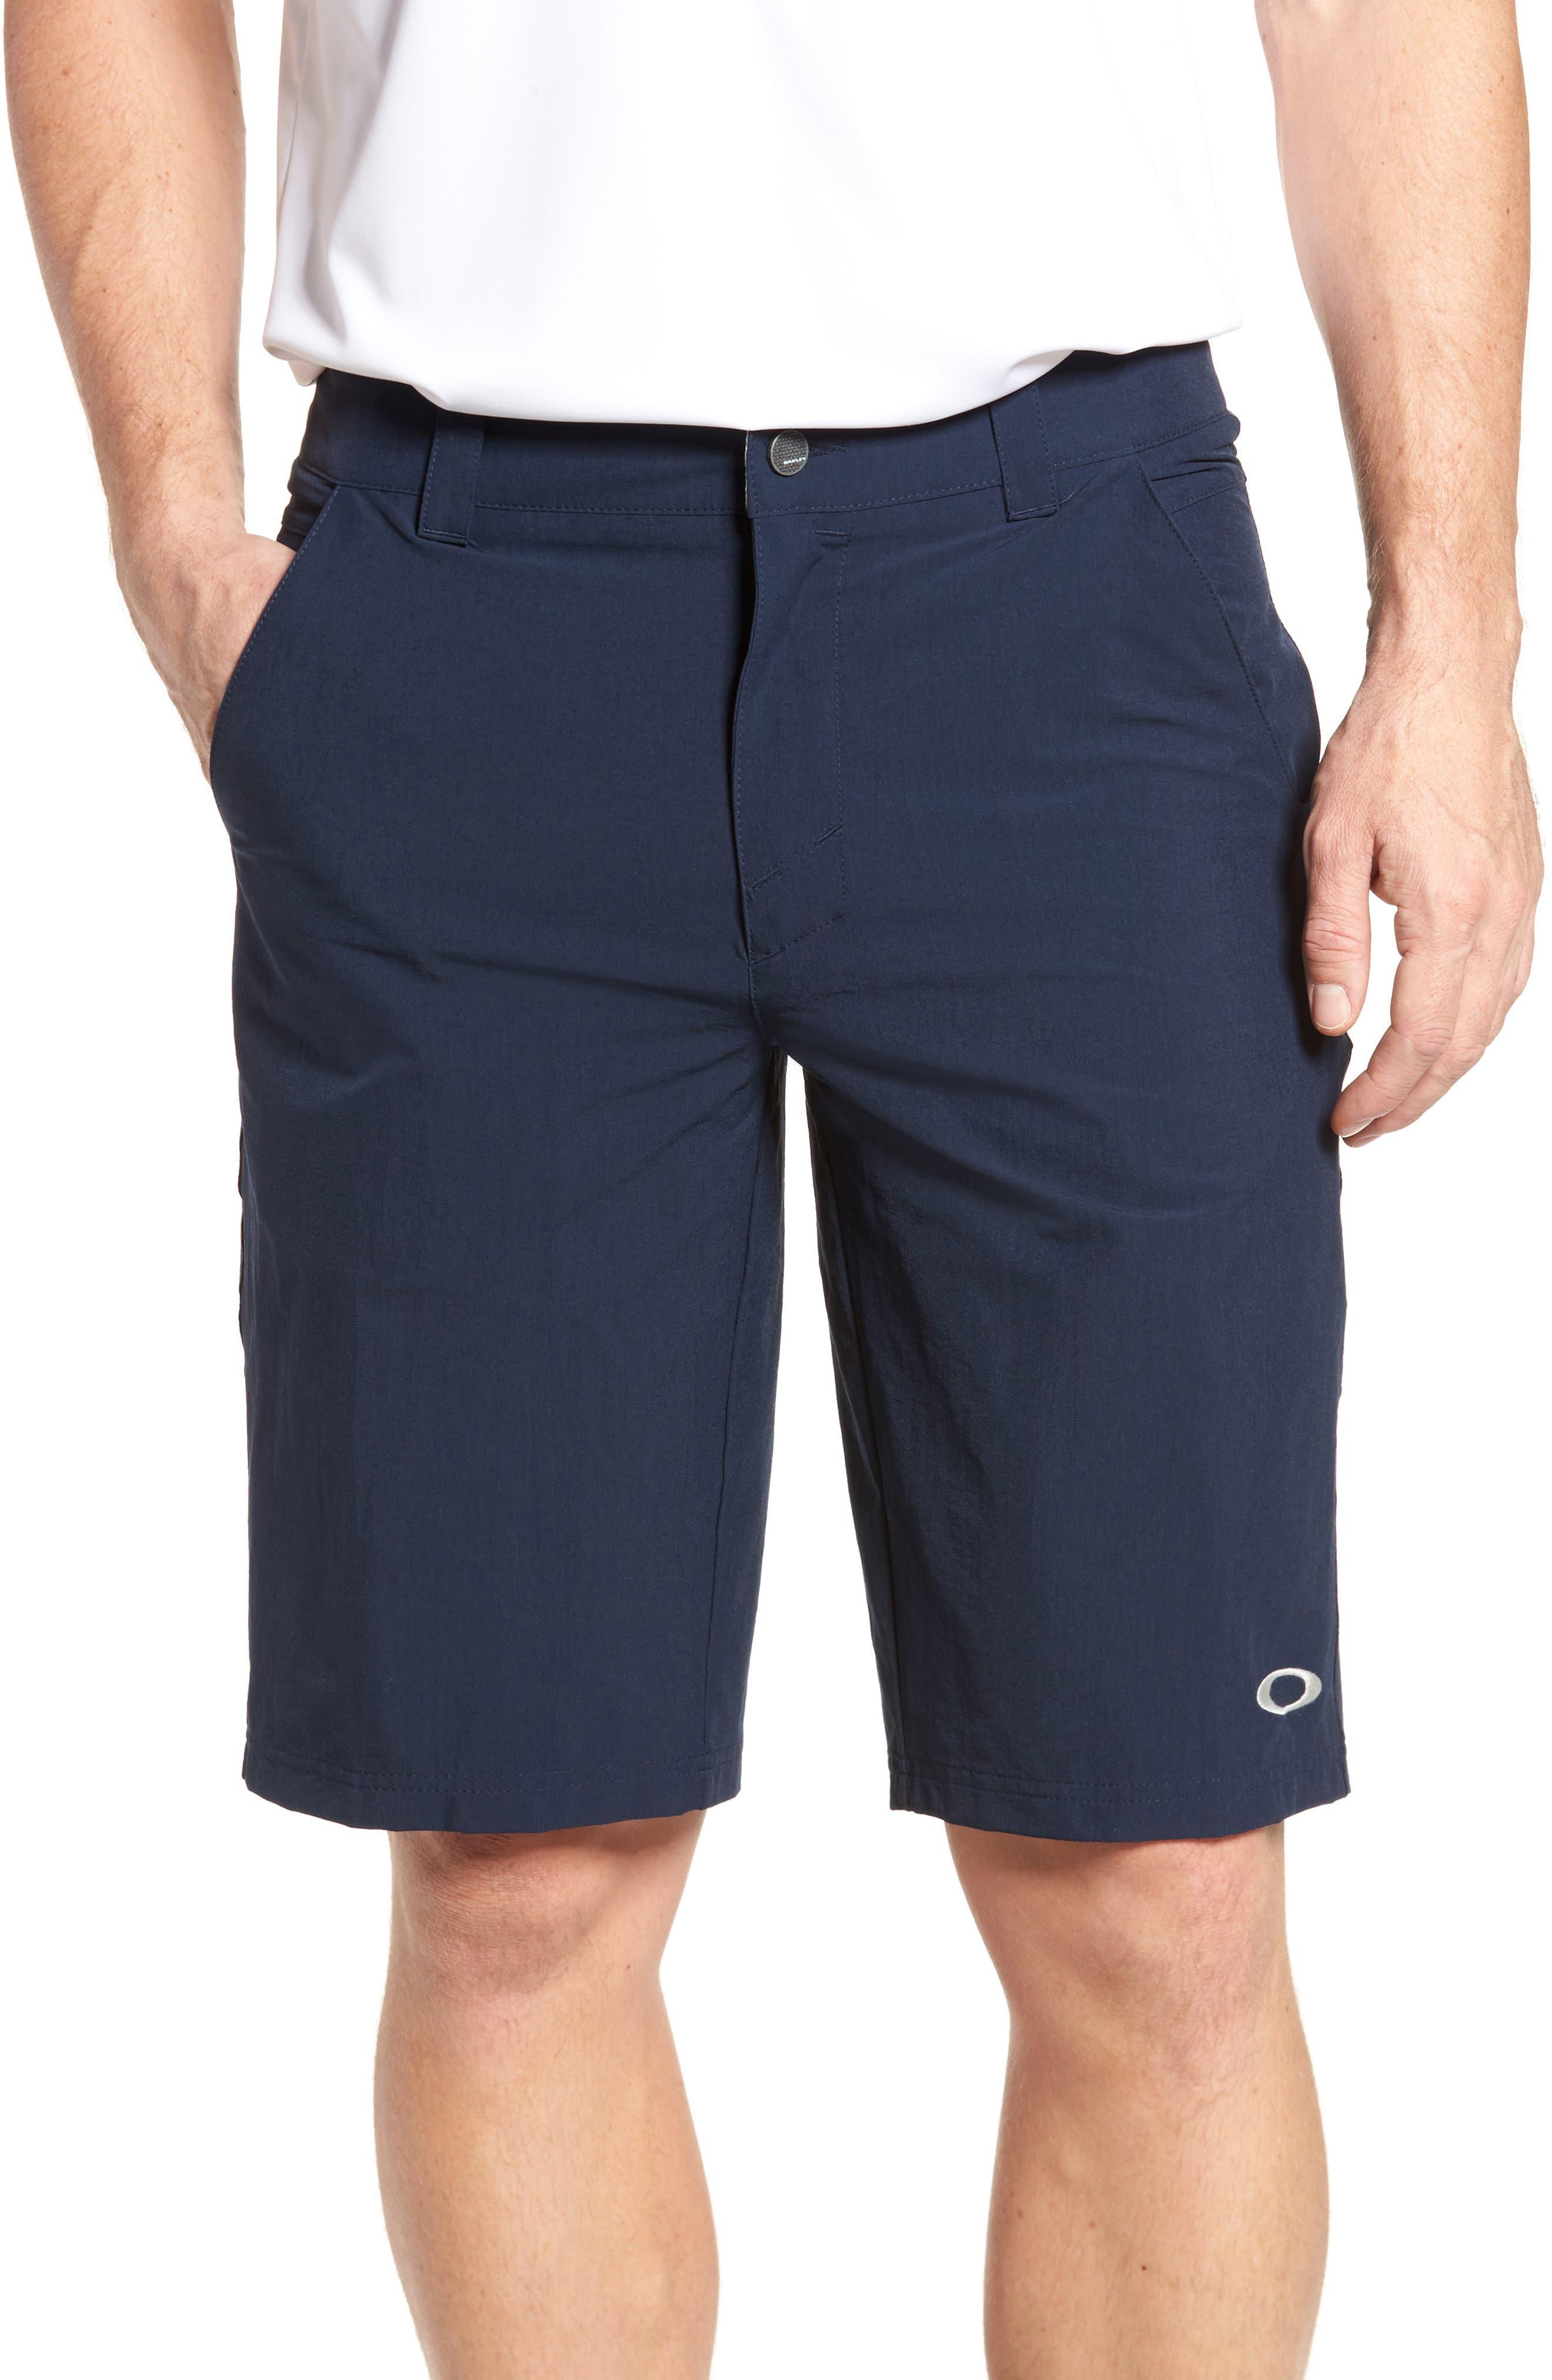 Take 2.5 Shorts,                             Main thumbnail 1, color,                             Fathom